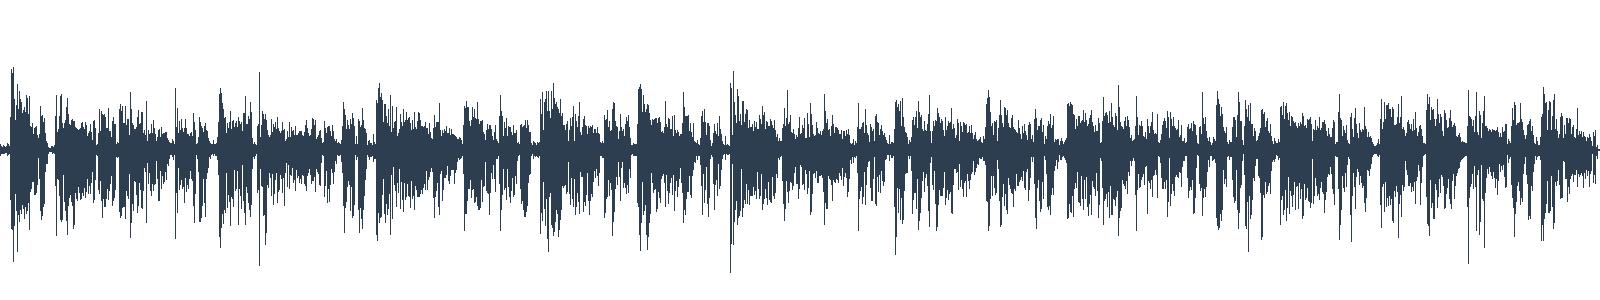 Nové audioknihy 21/2019 waveform